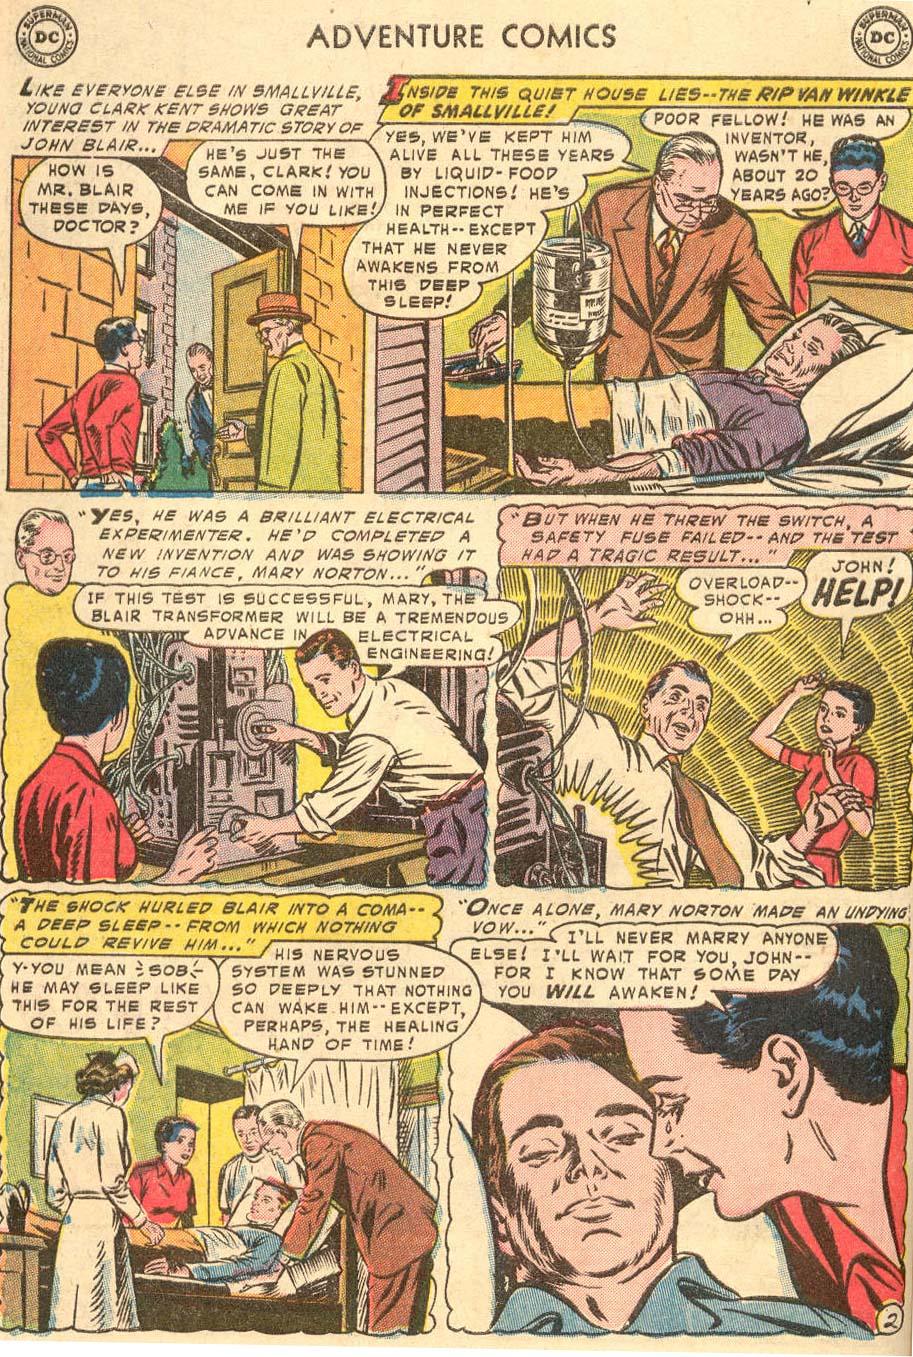 Read online Adventure Comics (1938) comic -  Issue #208 - 4